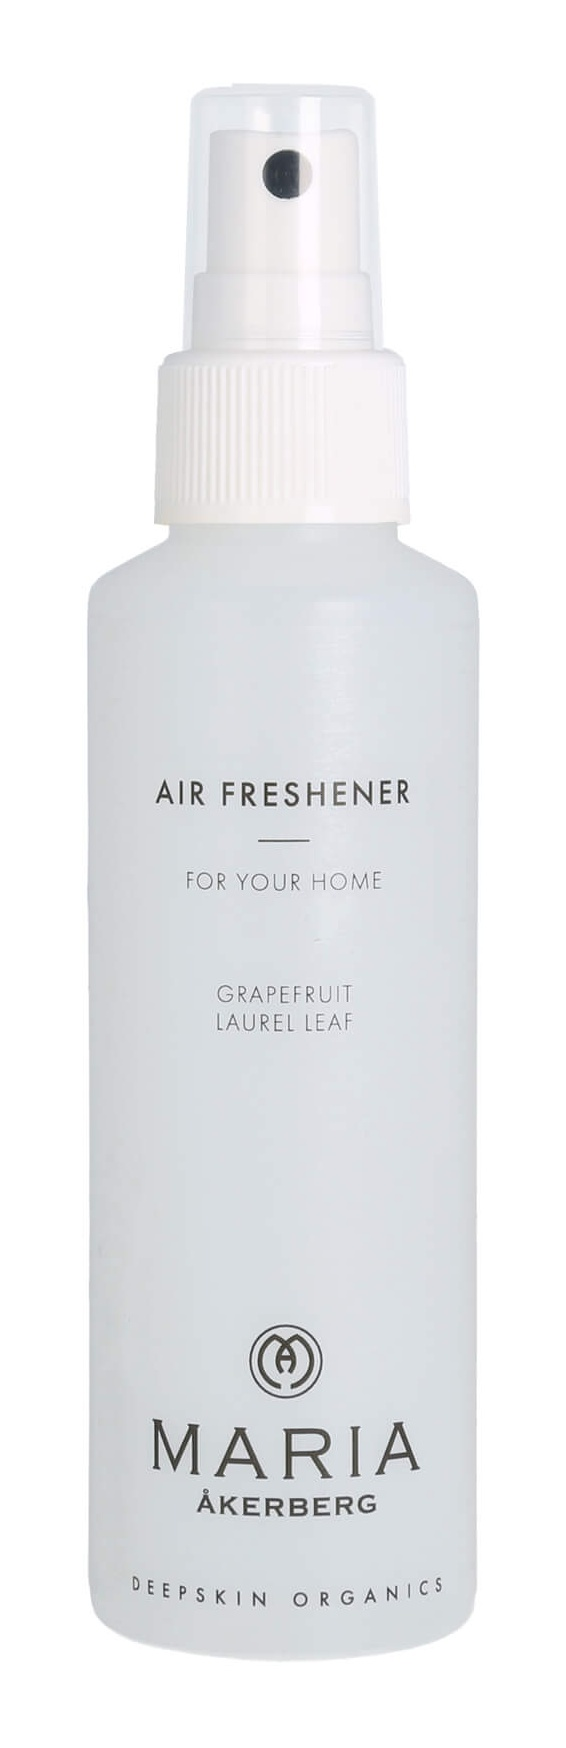 Maria Åkerberg Air Freshener